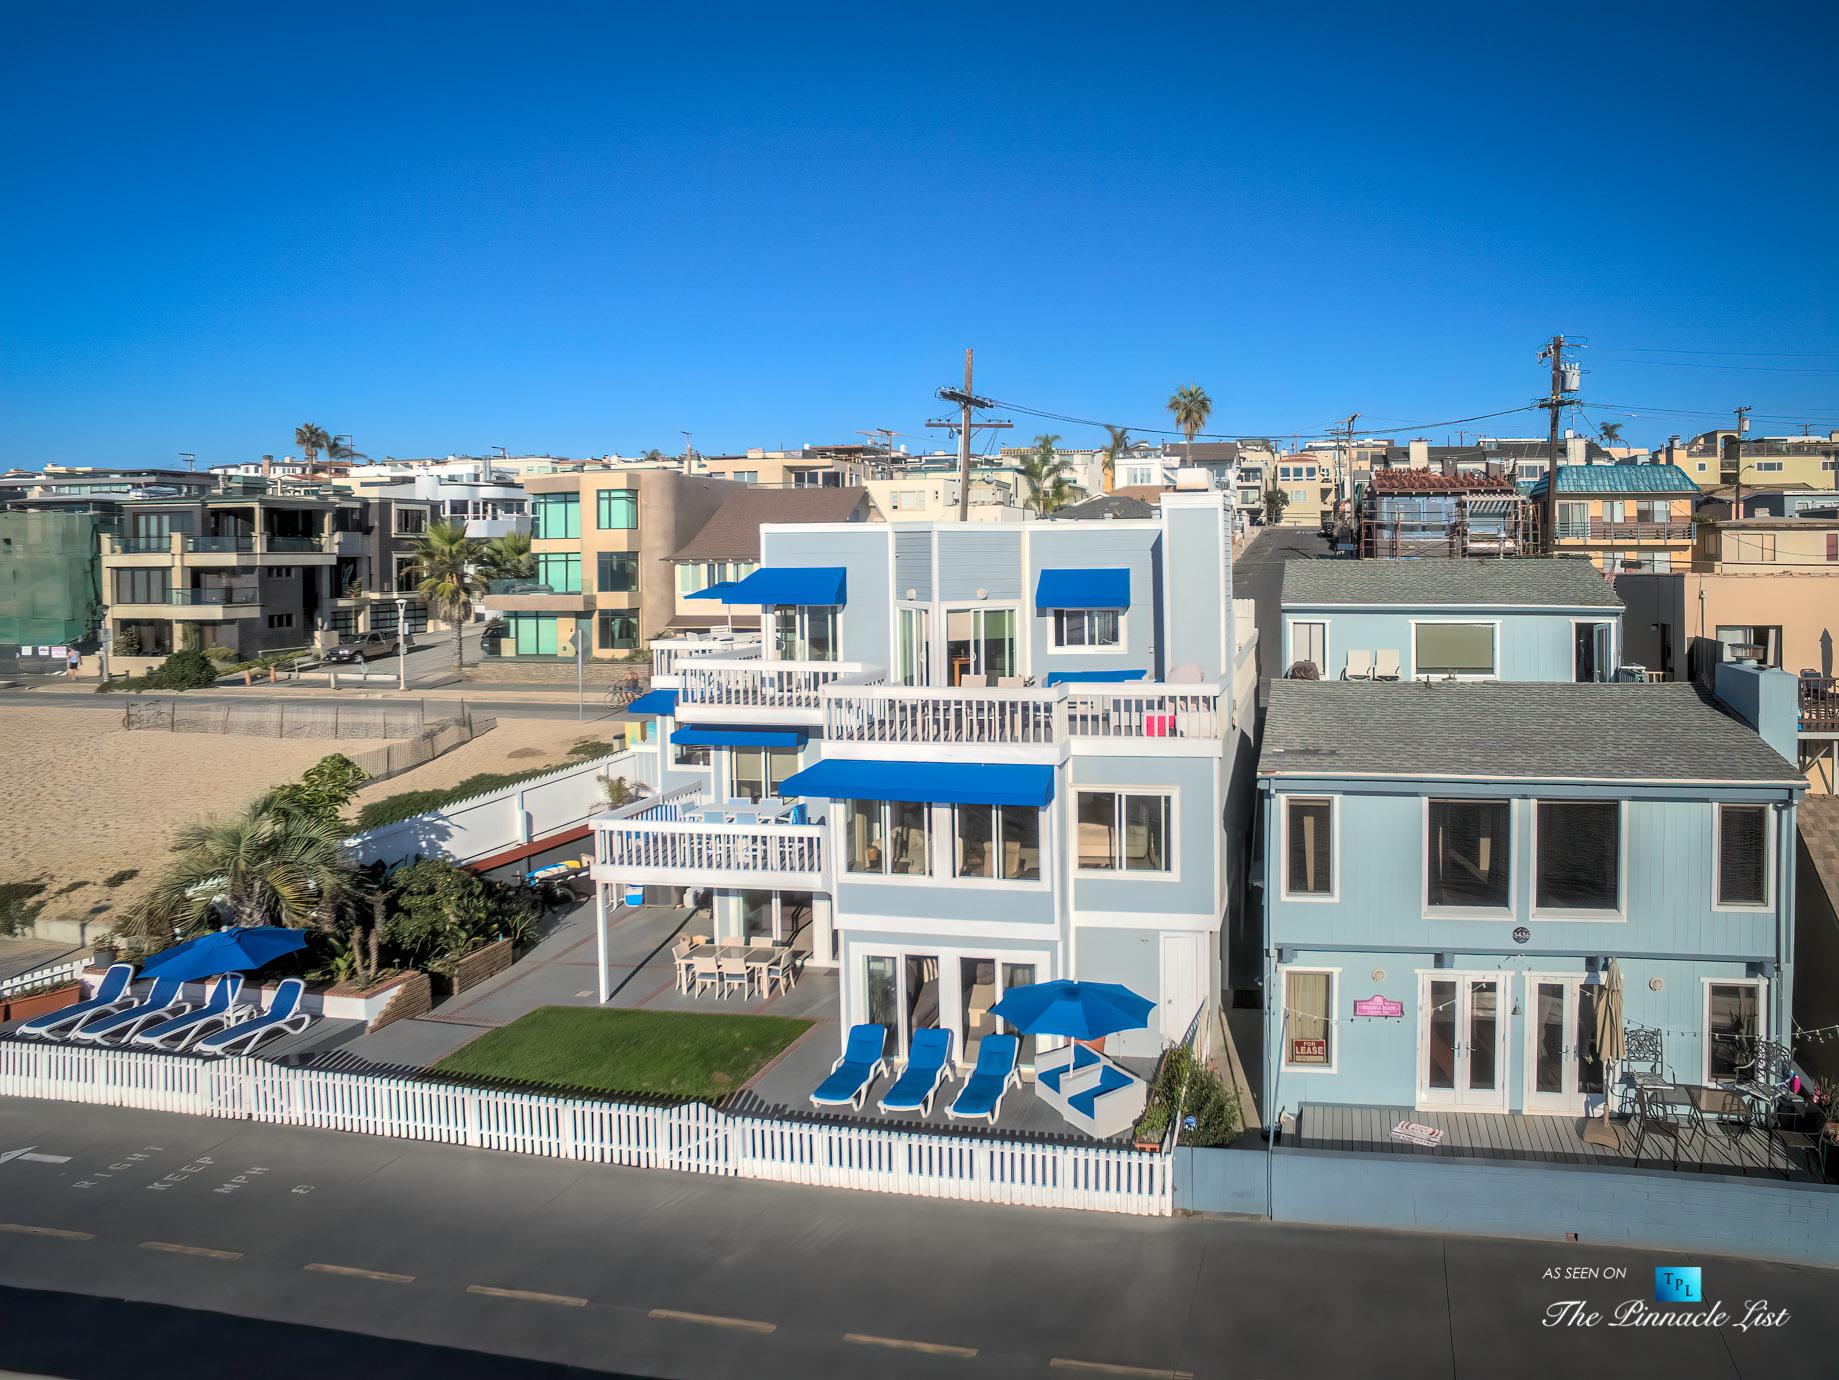 3500 The Strand, Hermosa Beach, CA, USA – Beachfront Luxury Real Estate – Original 90210 Beach House